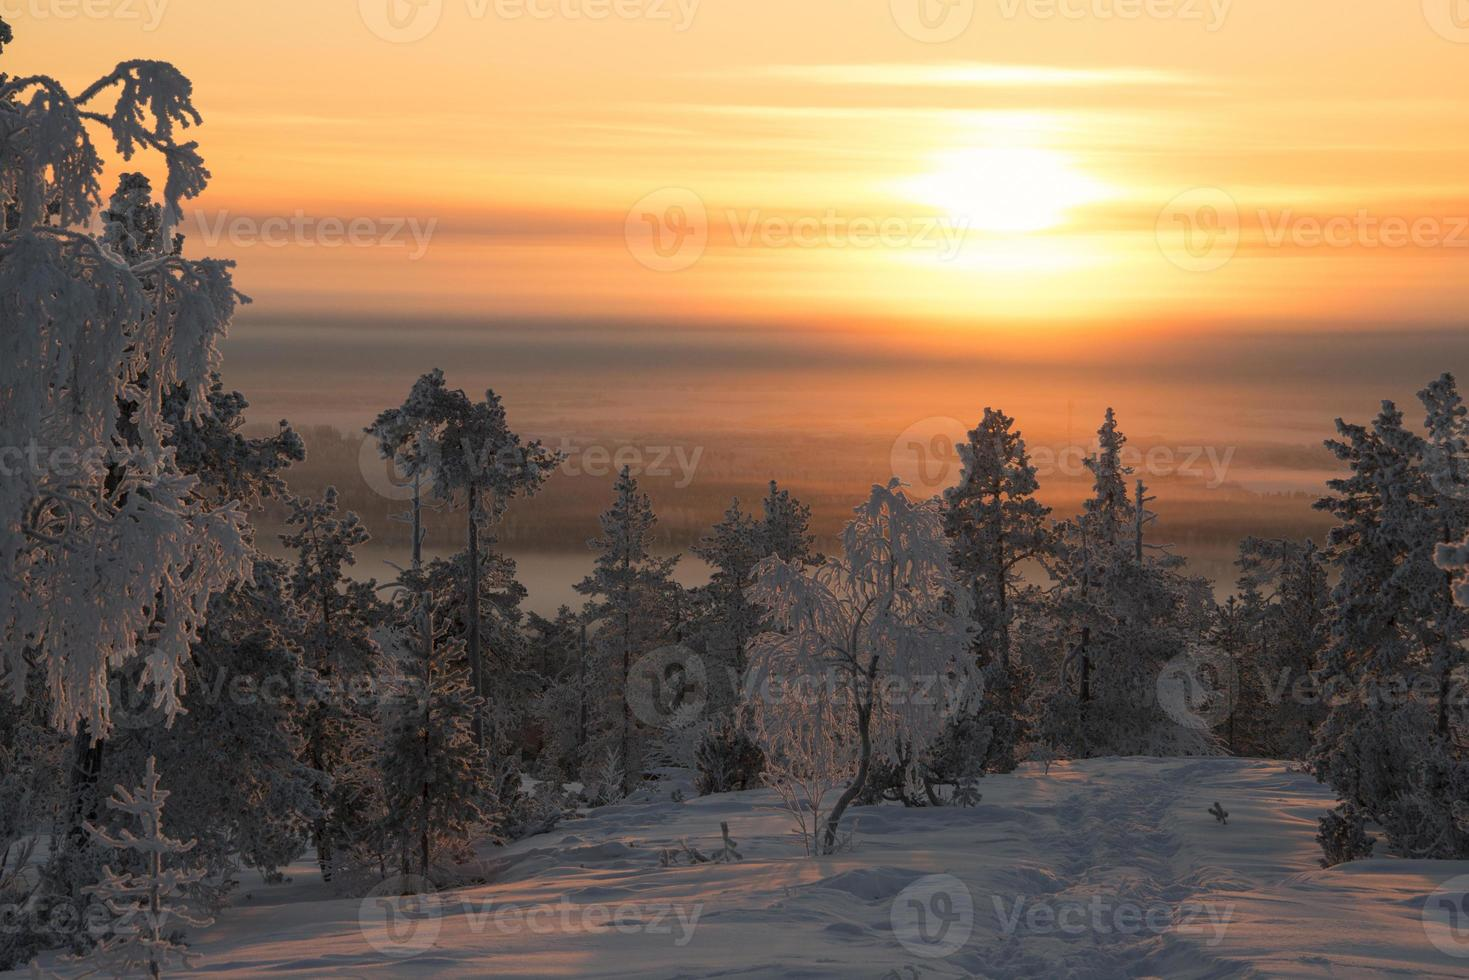 gyllene soluppgång över en frigid laplandsbacke foto